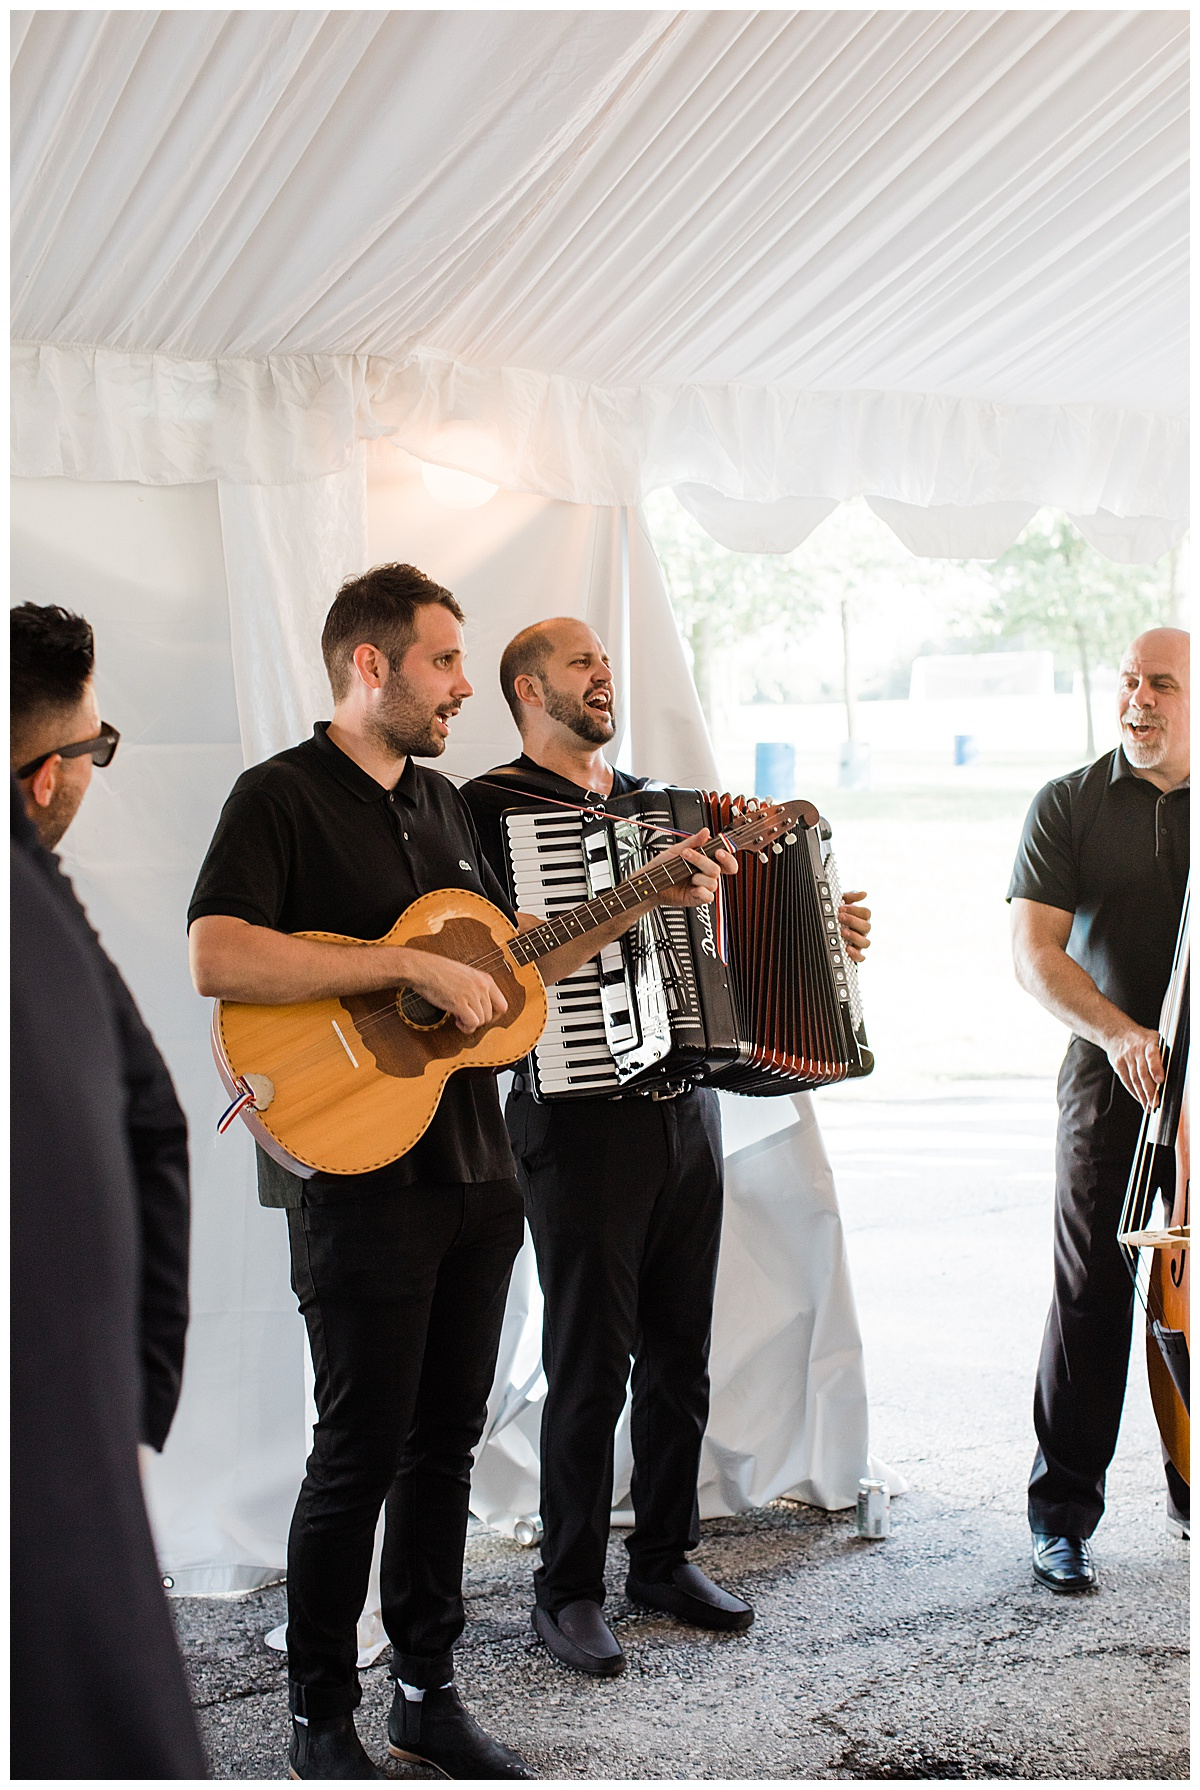 Live band at Ontario wedding  3photography